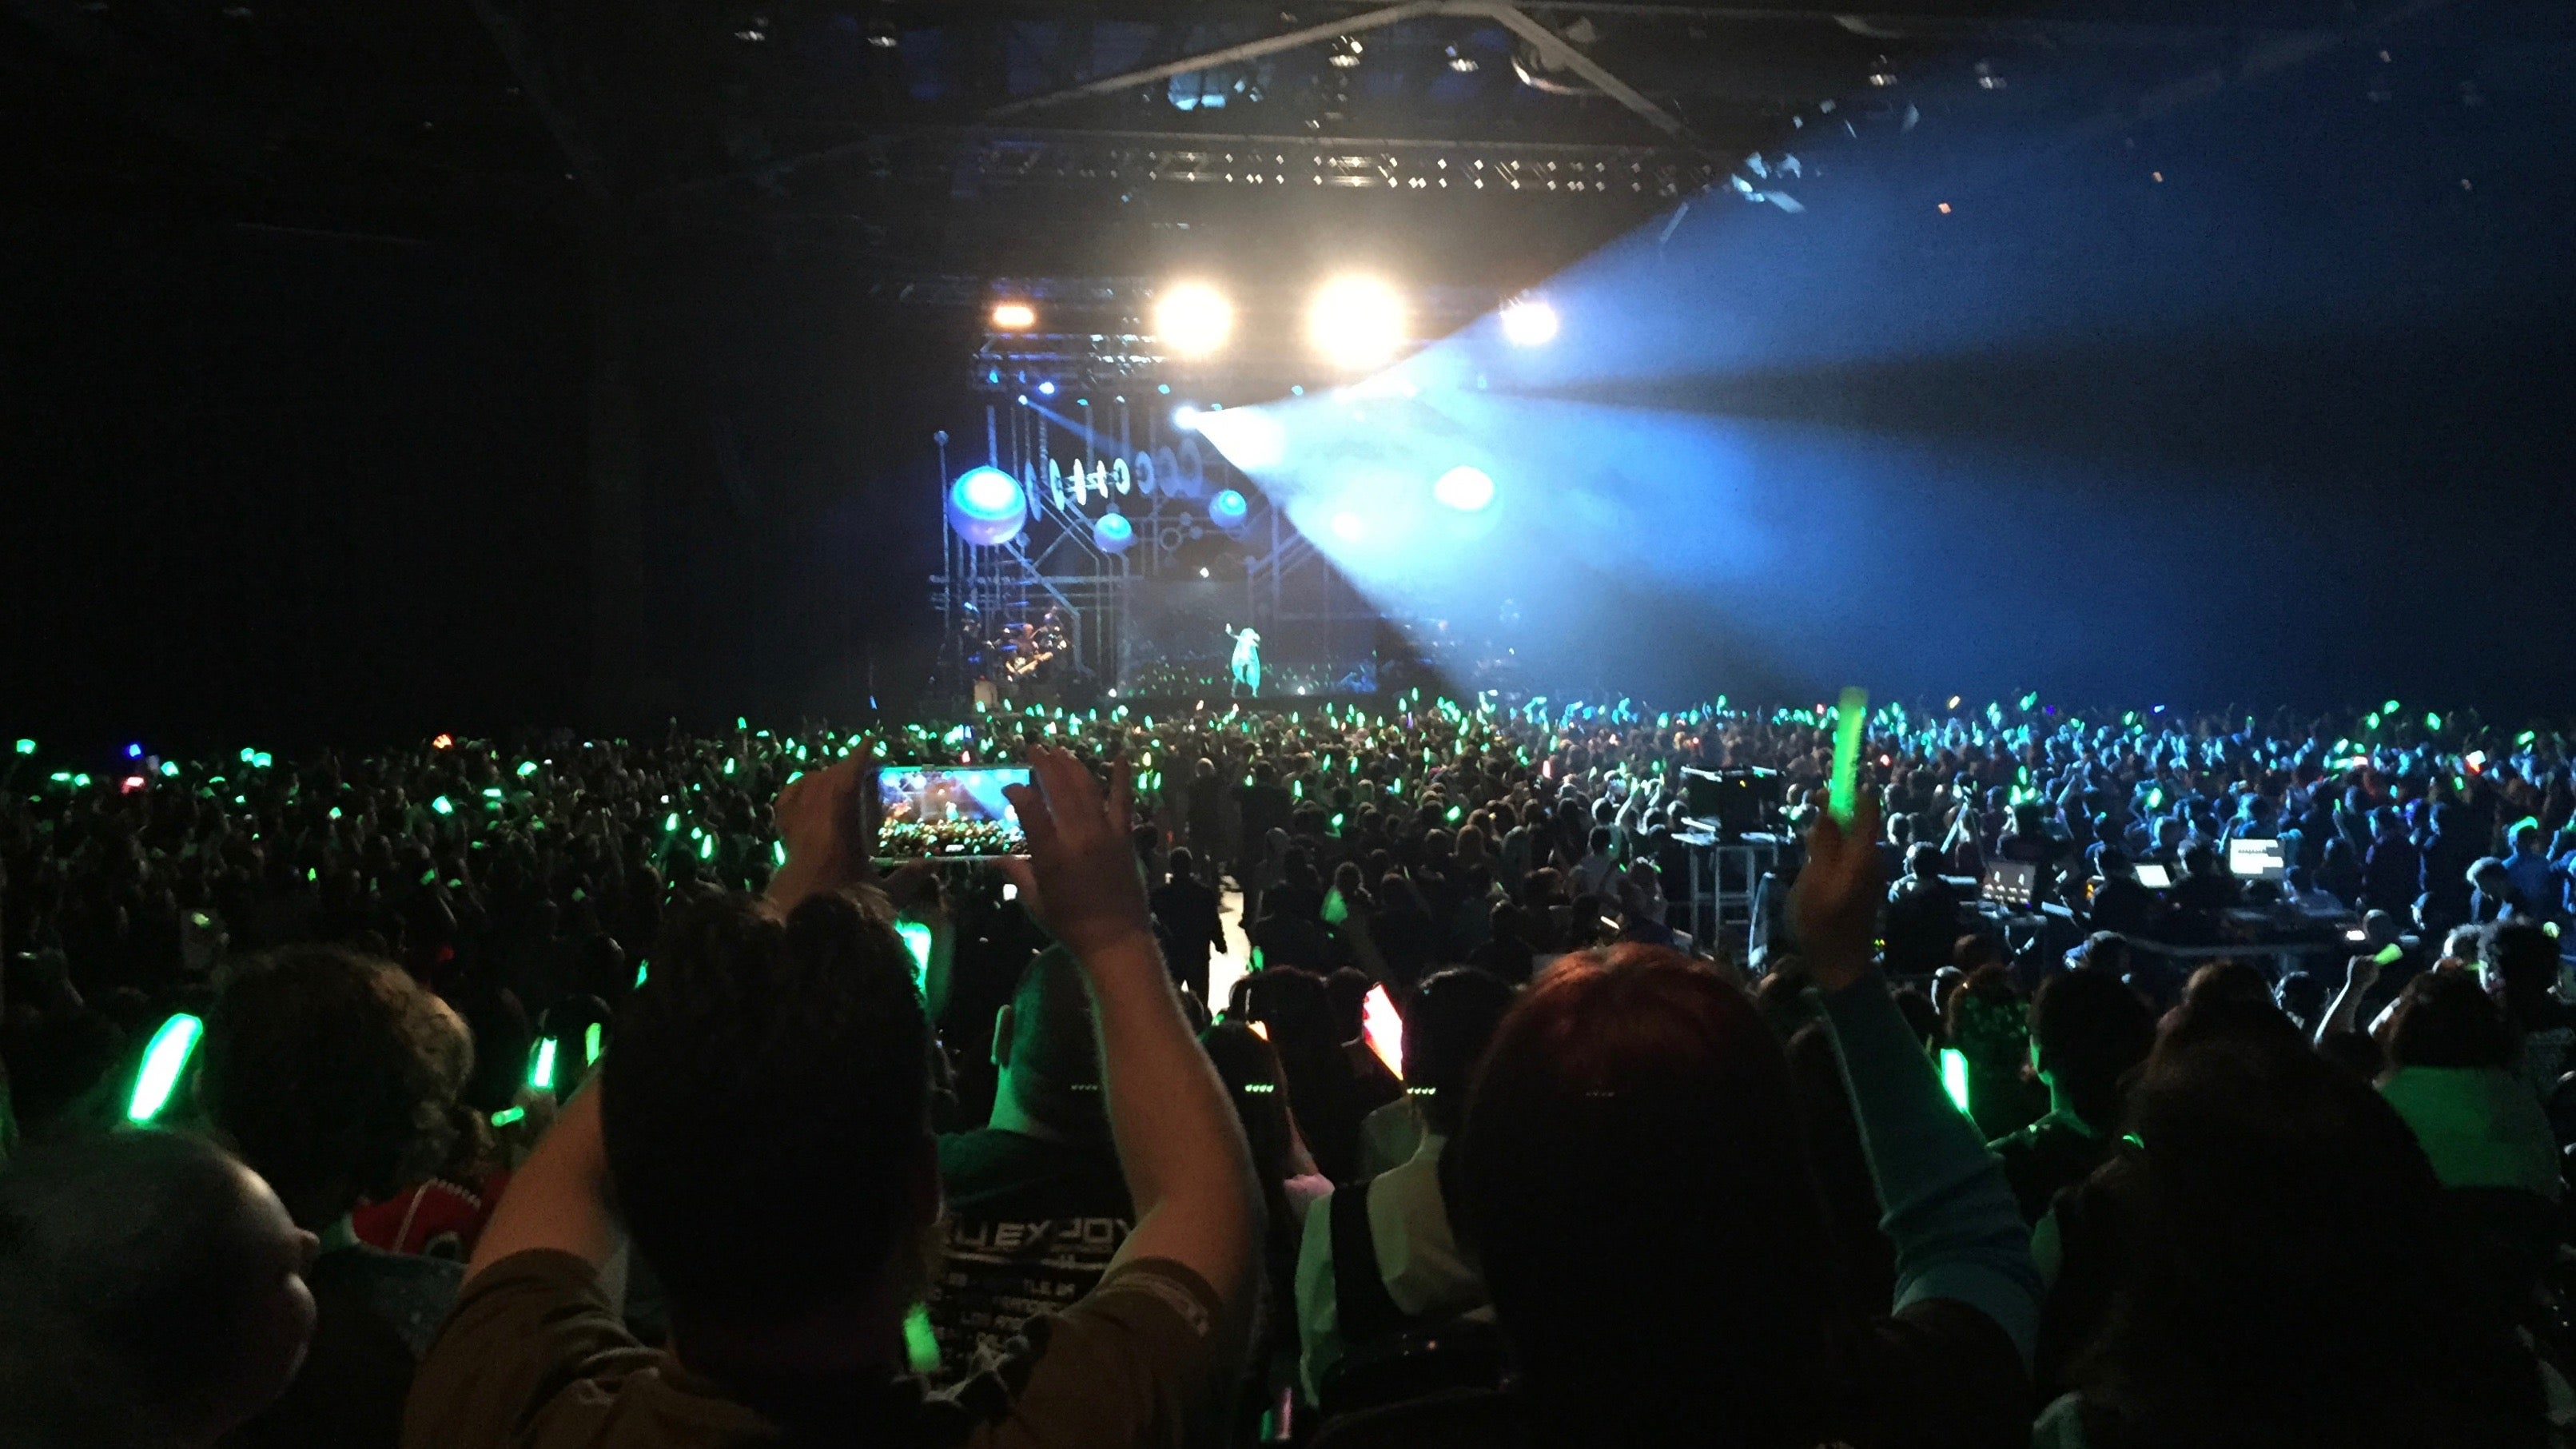 The Crowd Went Wild For Hatsune Miku, The Virtual Anime Pop Star